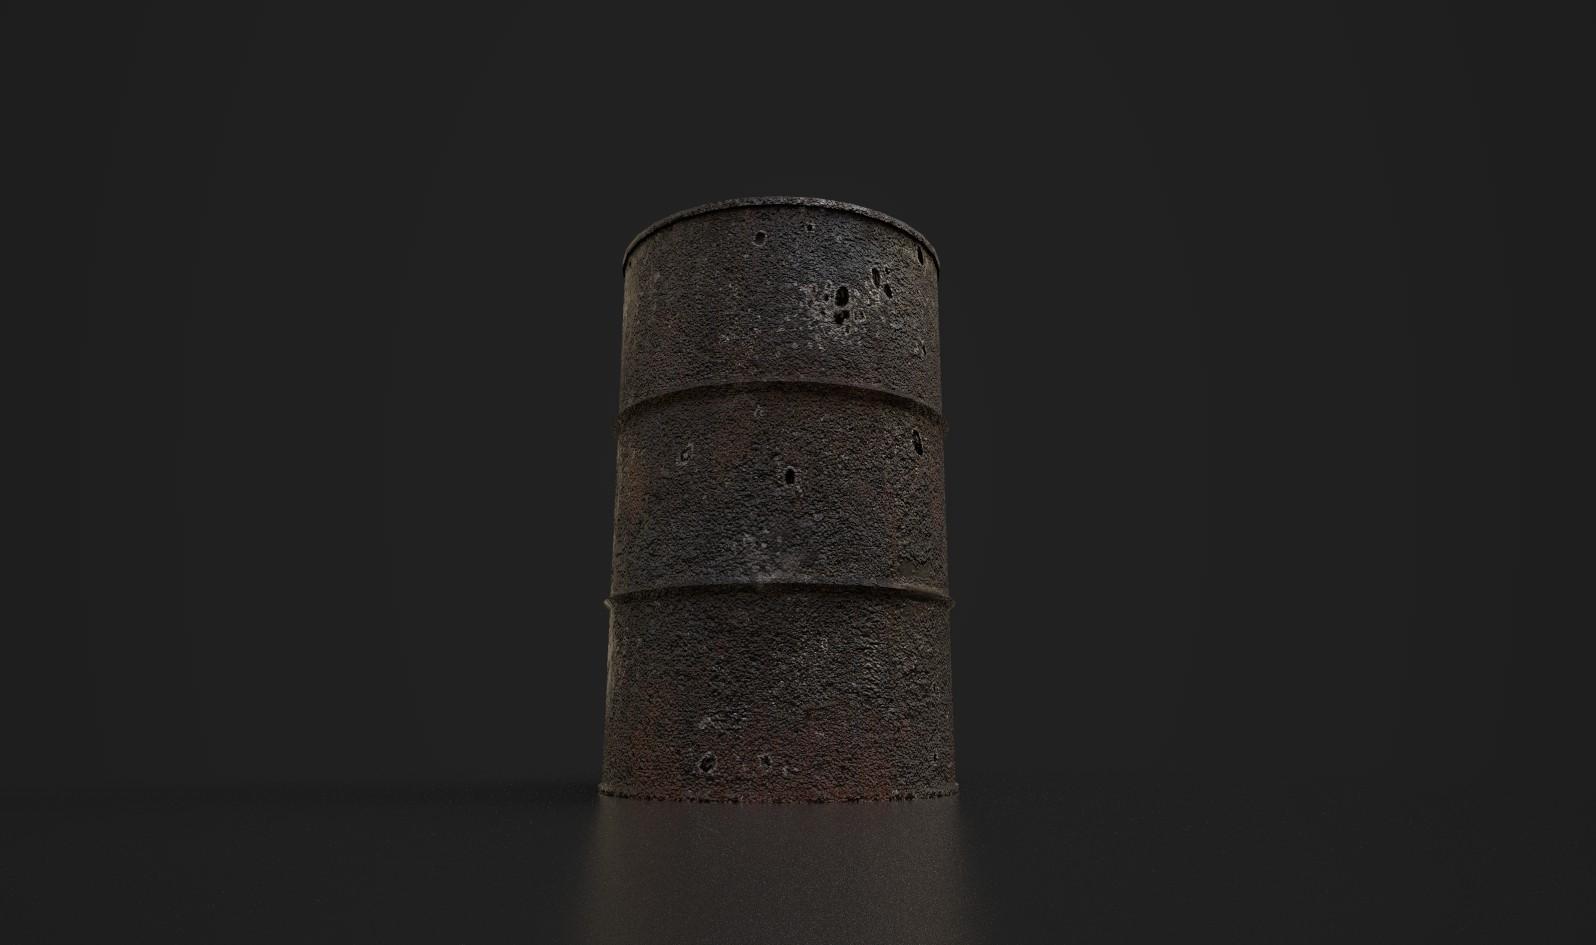 Edgar gomez barriln